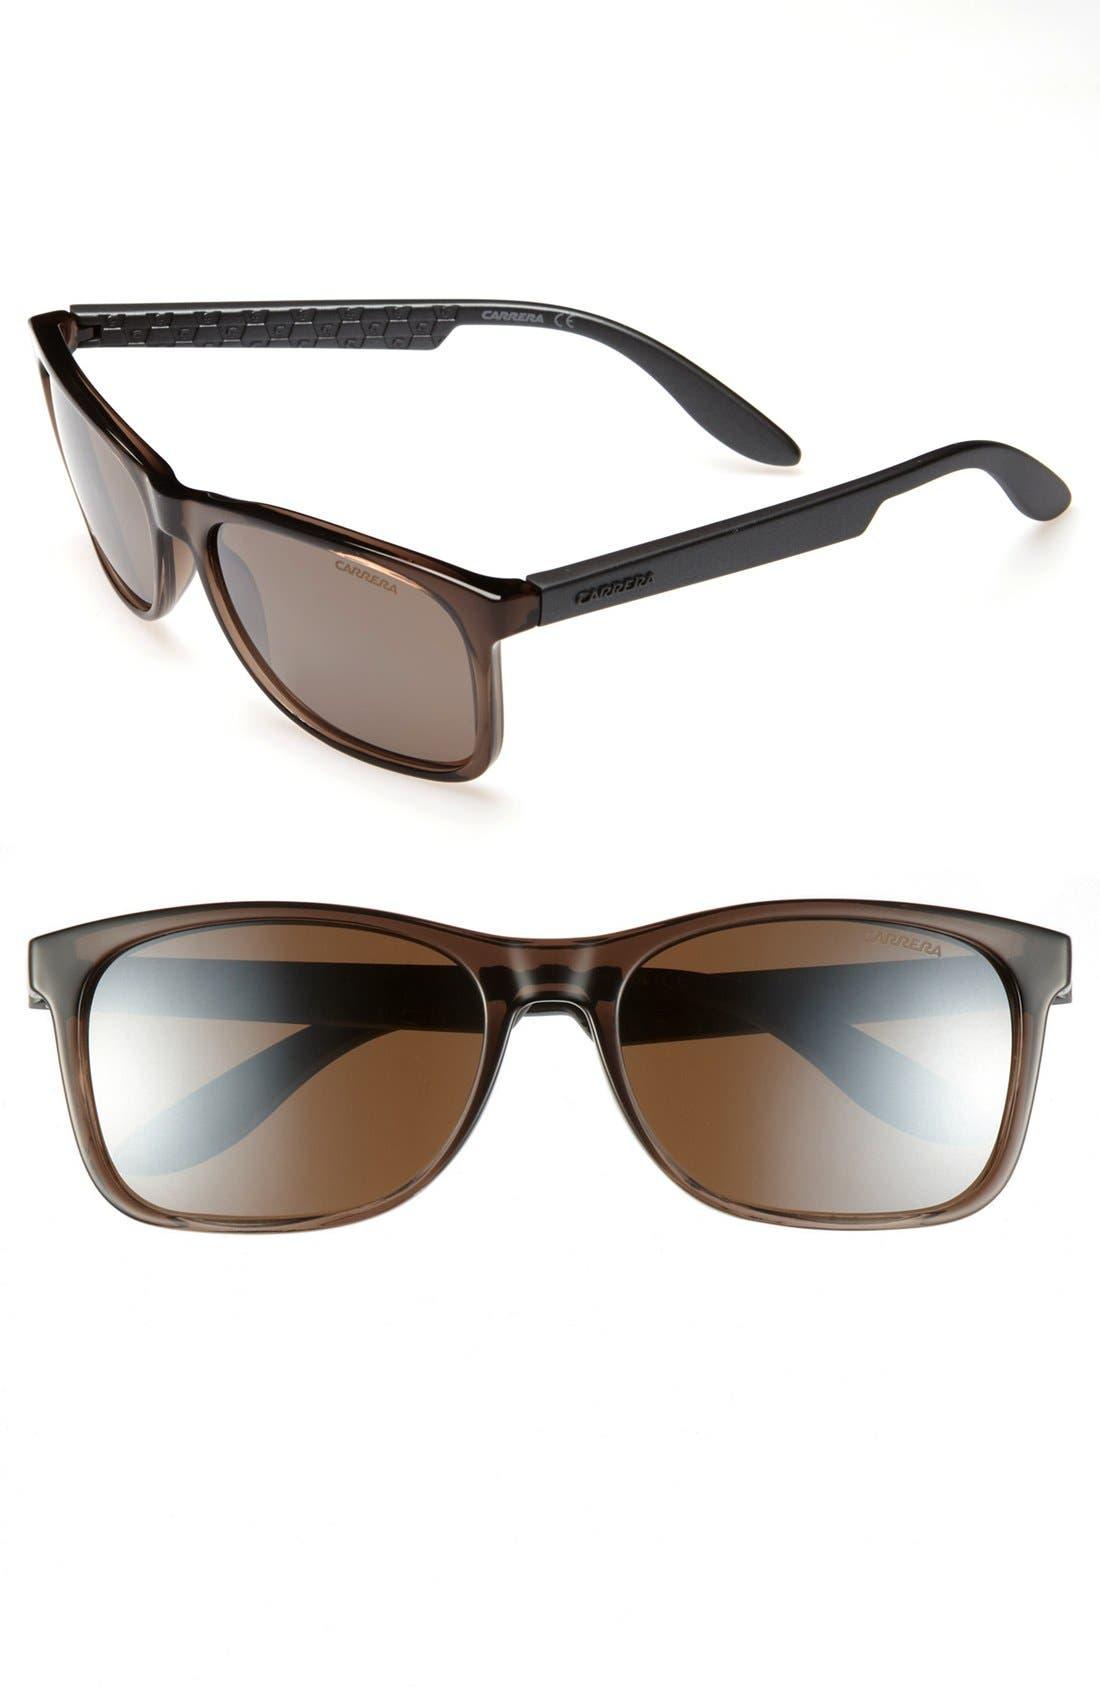 Alternate Image 1 Selected - Carrera Eyewear 56mm Sunglasses